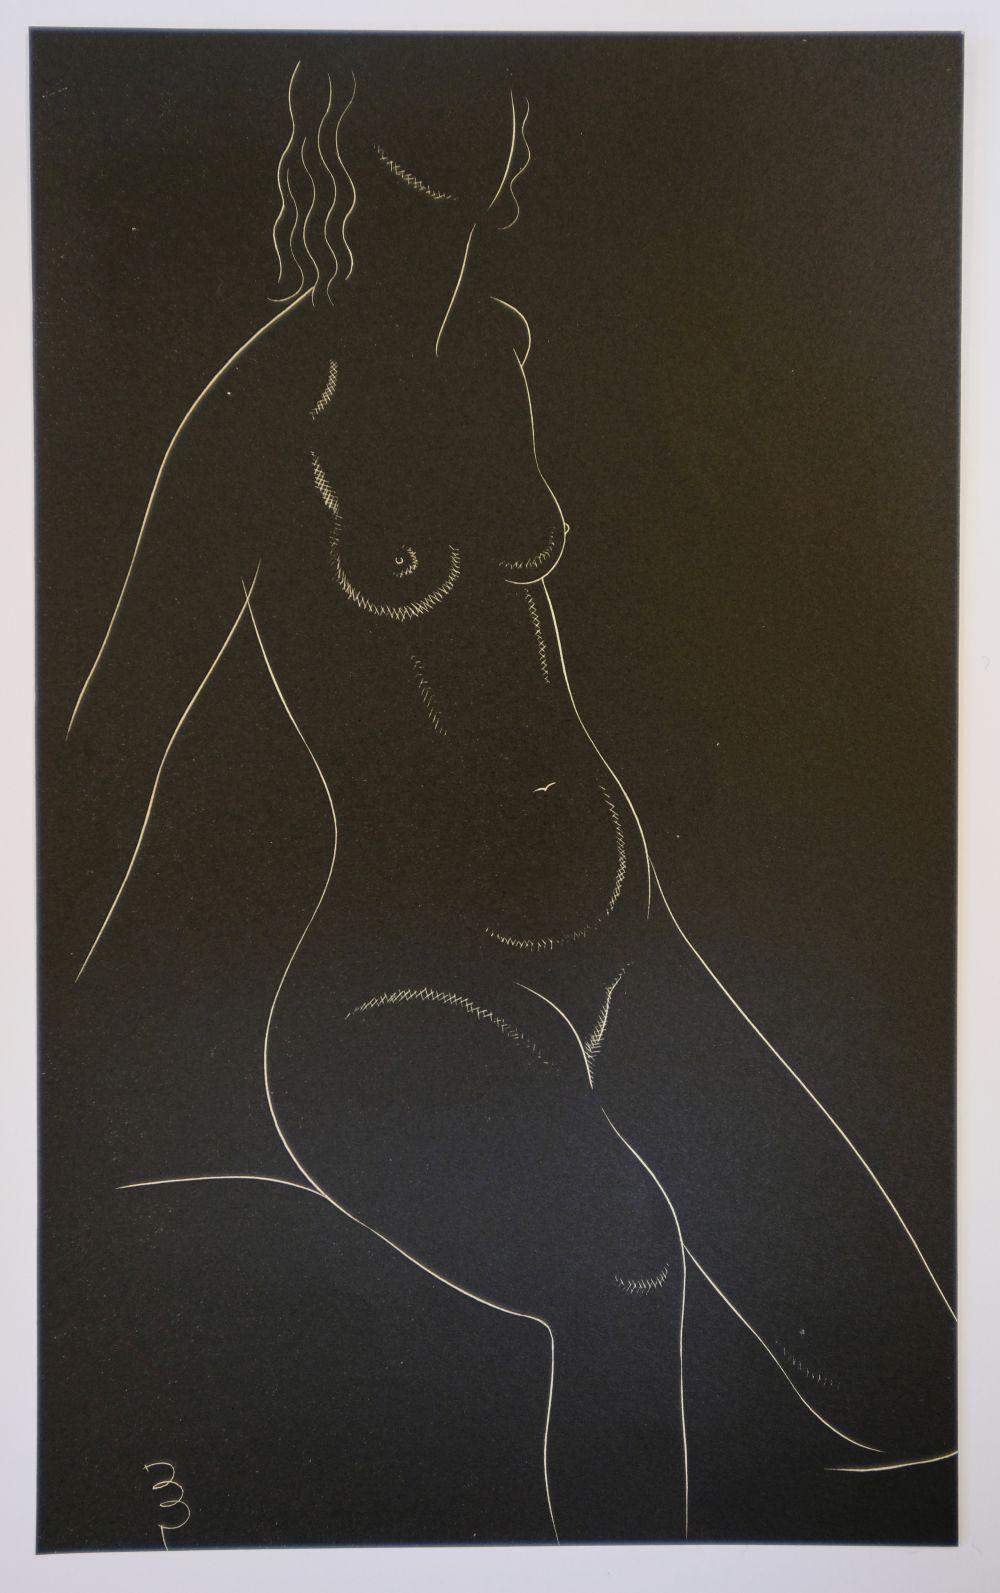 * Gill (Eric, 1882-1940). Twenty-Five Nudes: Six Plates, 1937 - Image 7 of 7